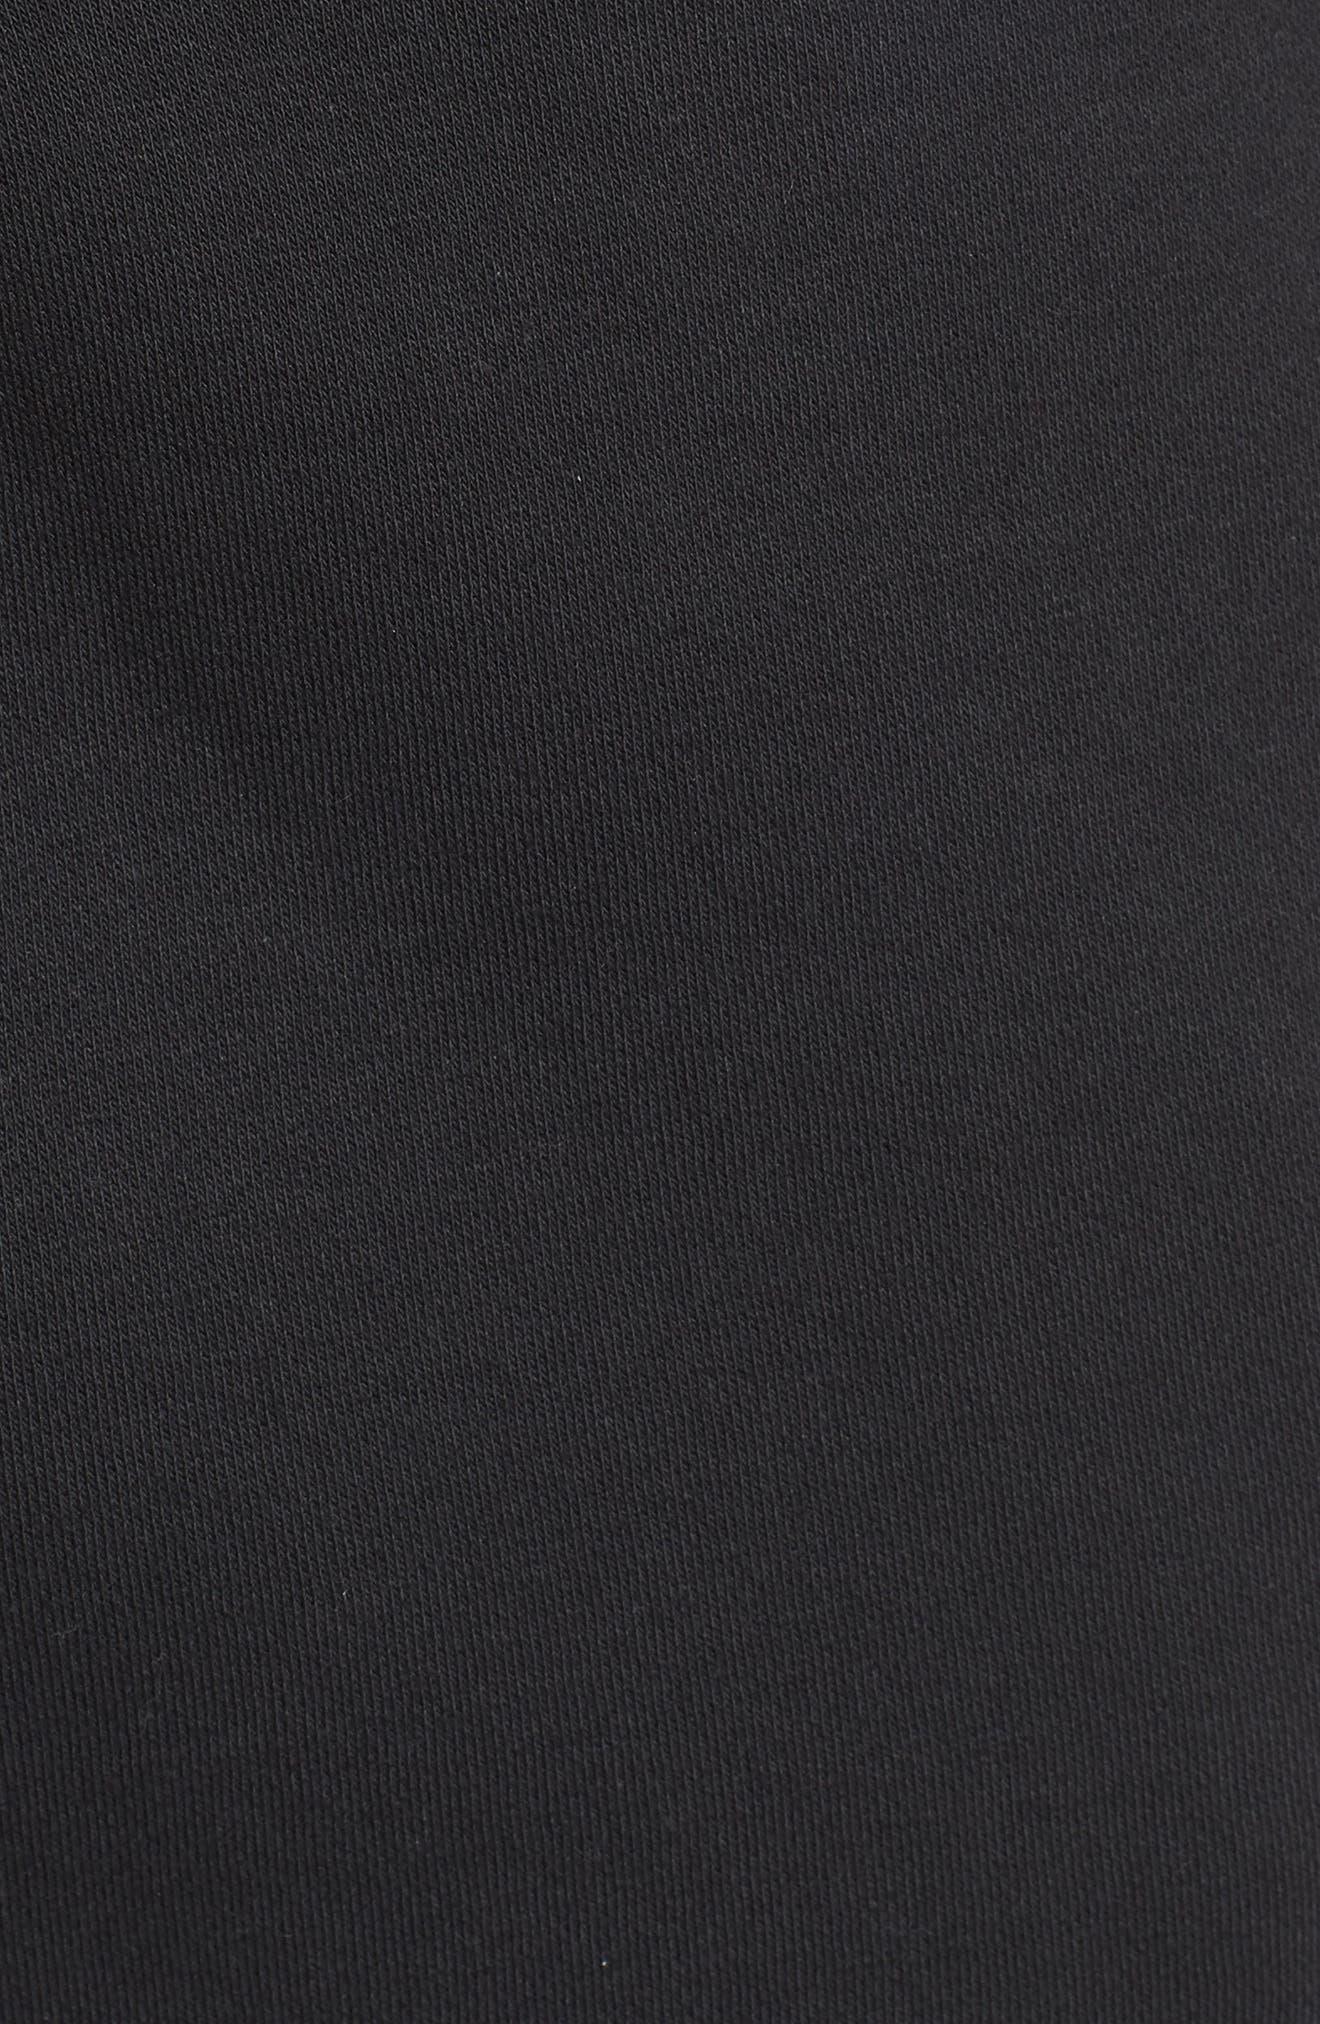 REEBOK,                             Vector Logo Sweatpants,                             Alternate thumbnail 5, color,                             BLACK